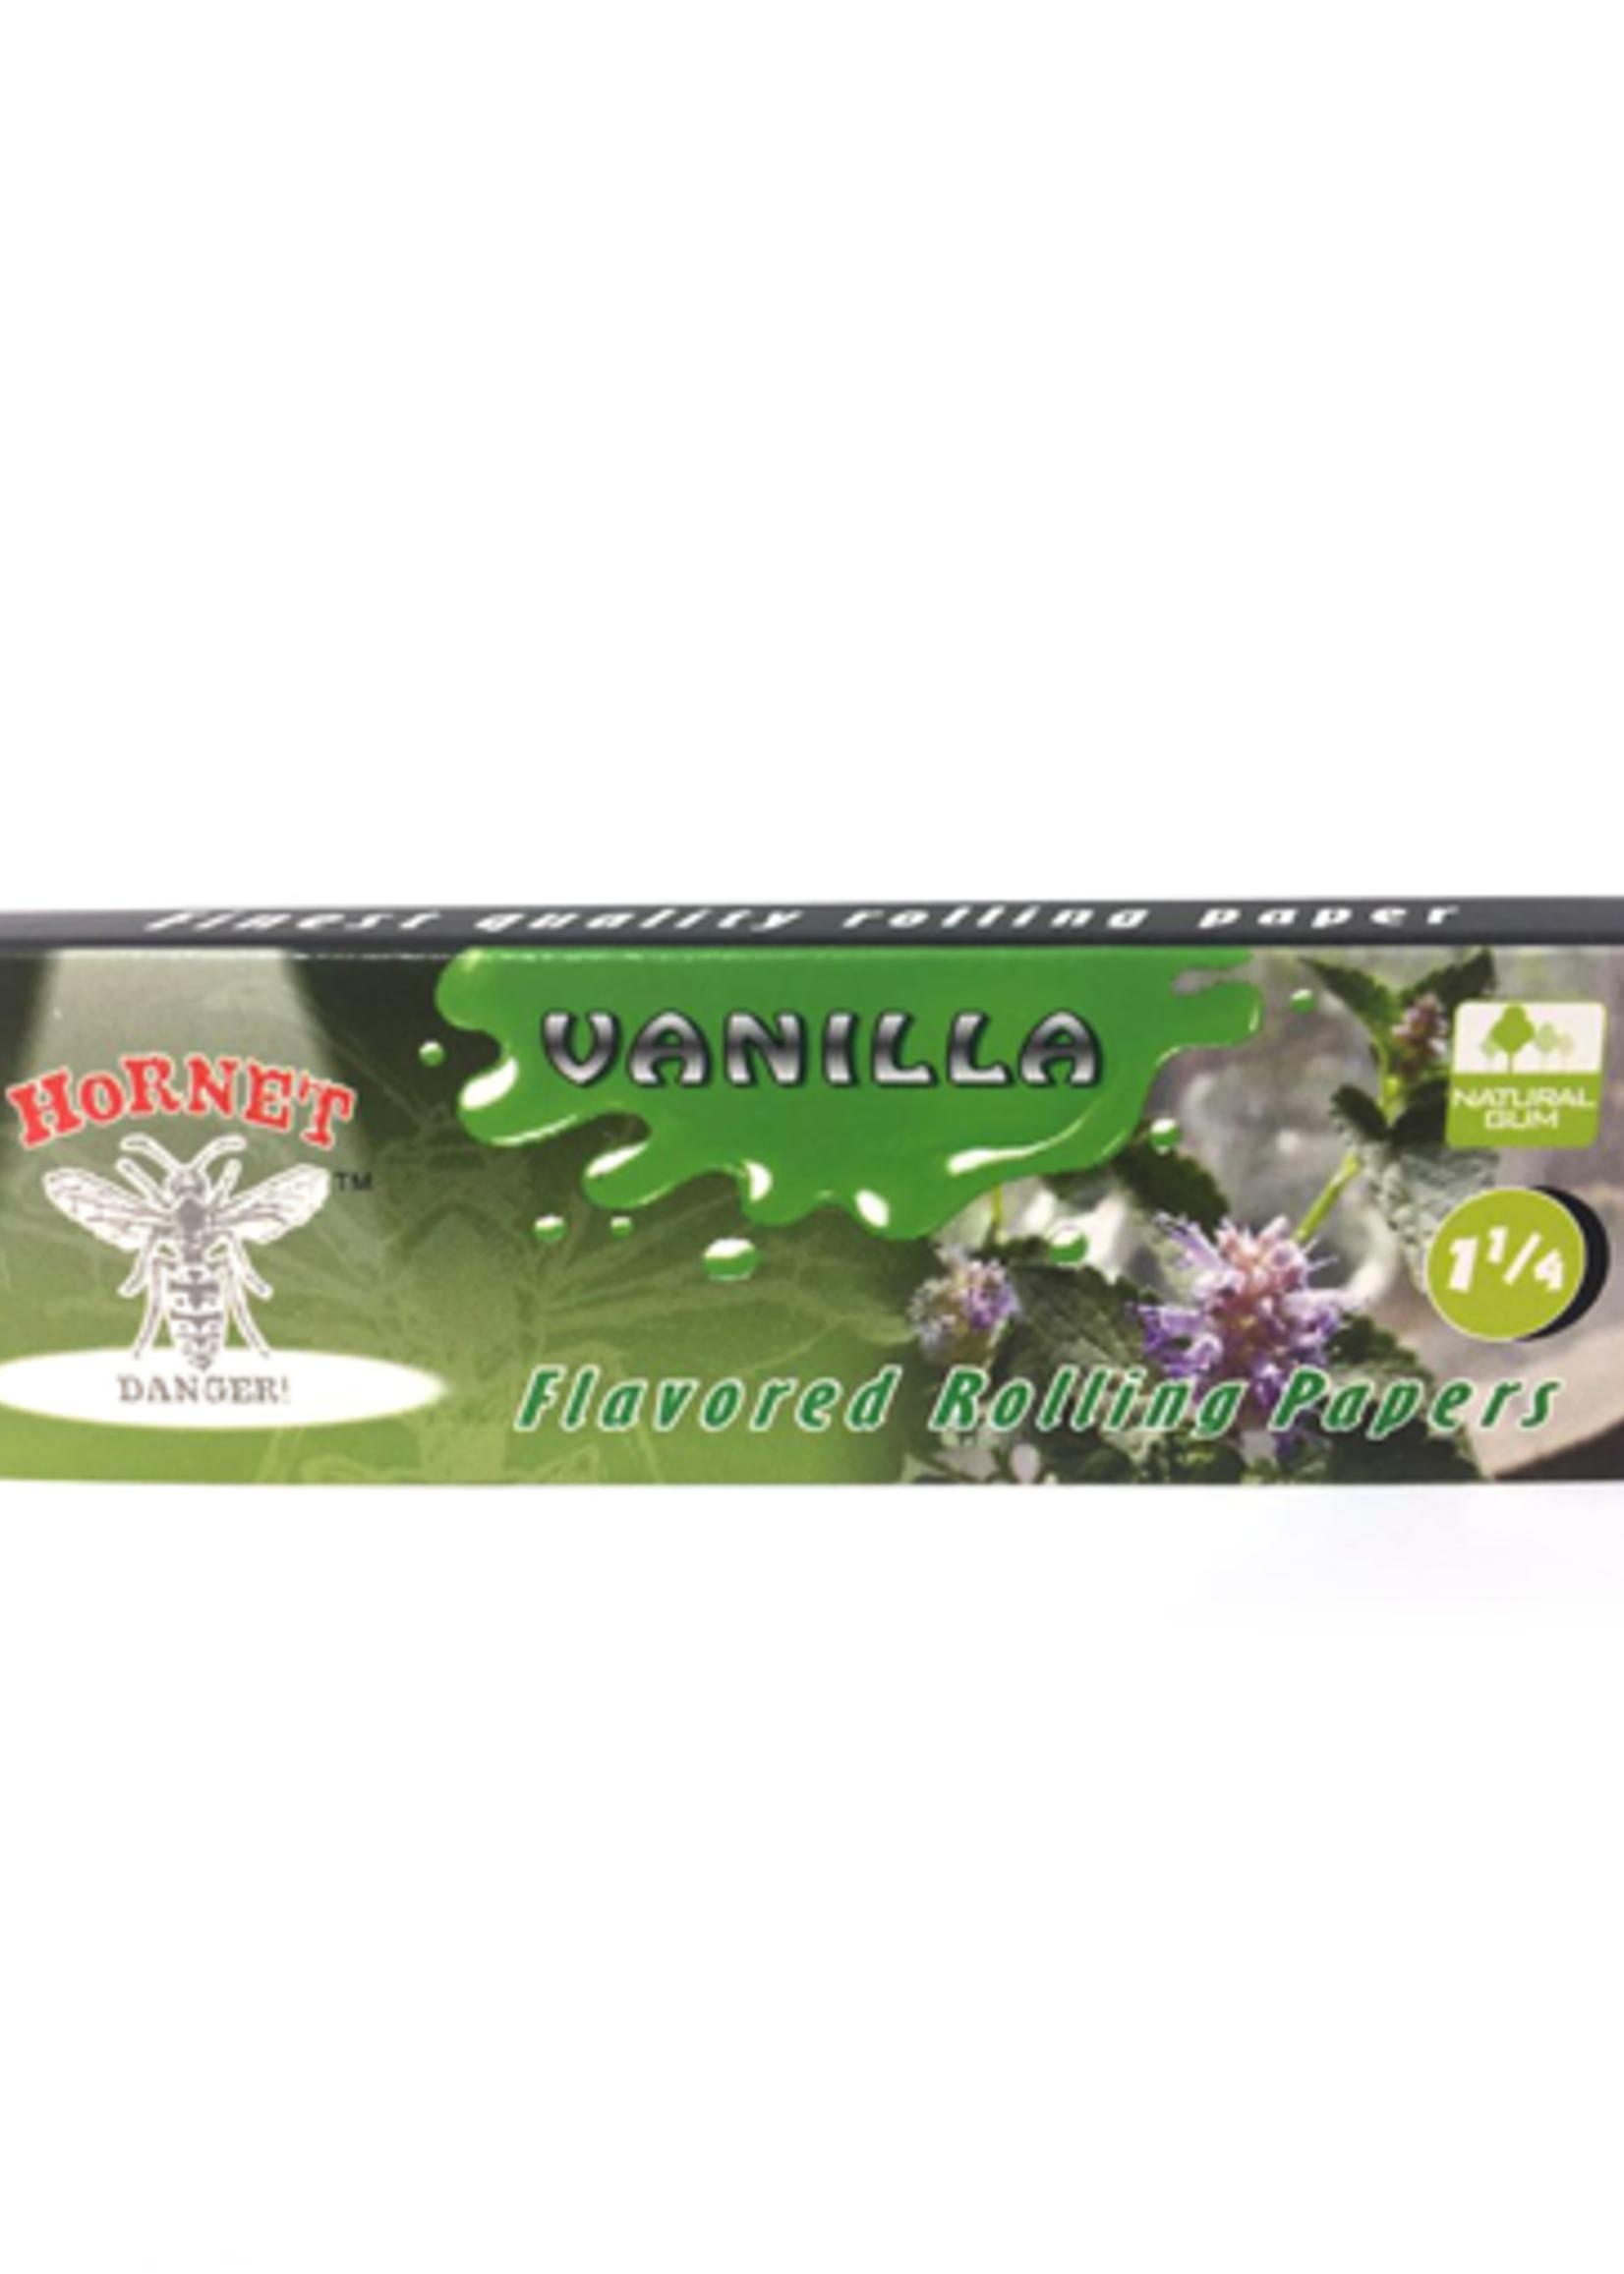 Hornet rolling paper - Vanilla